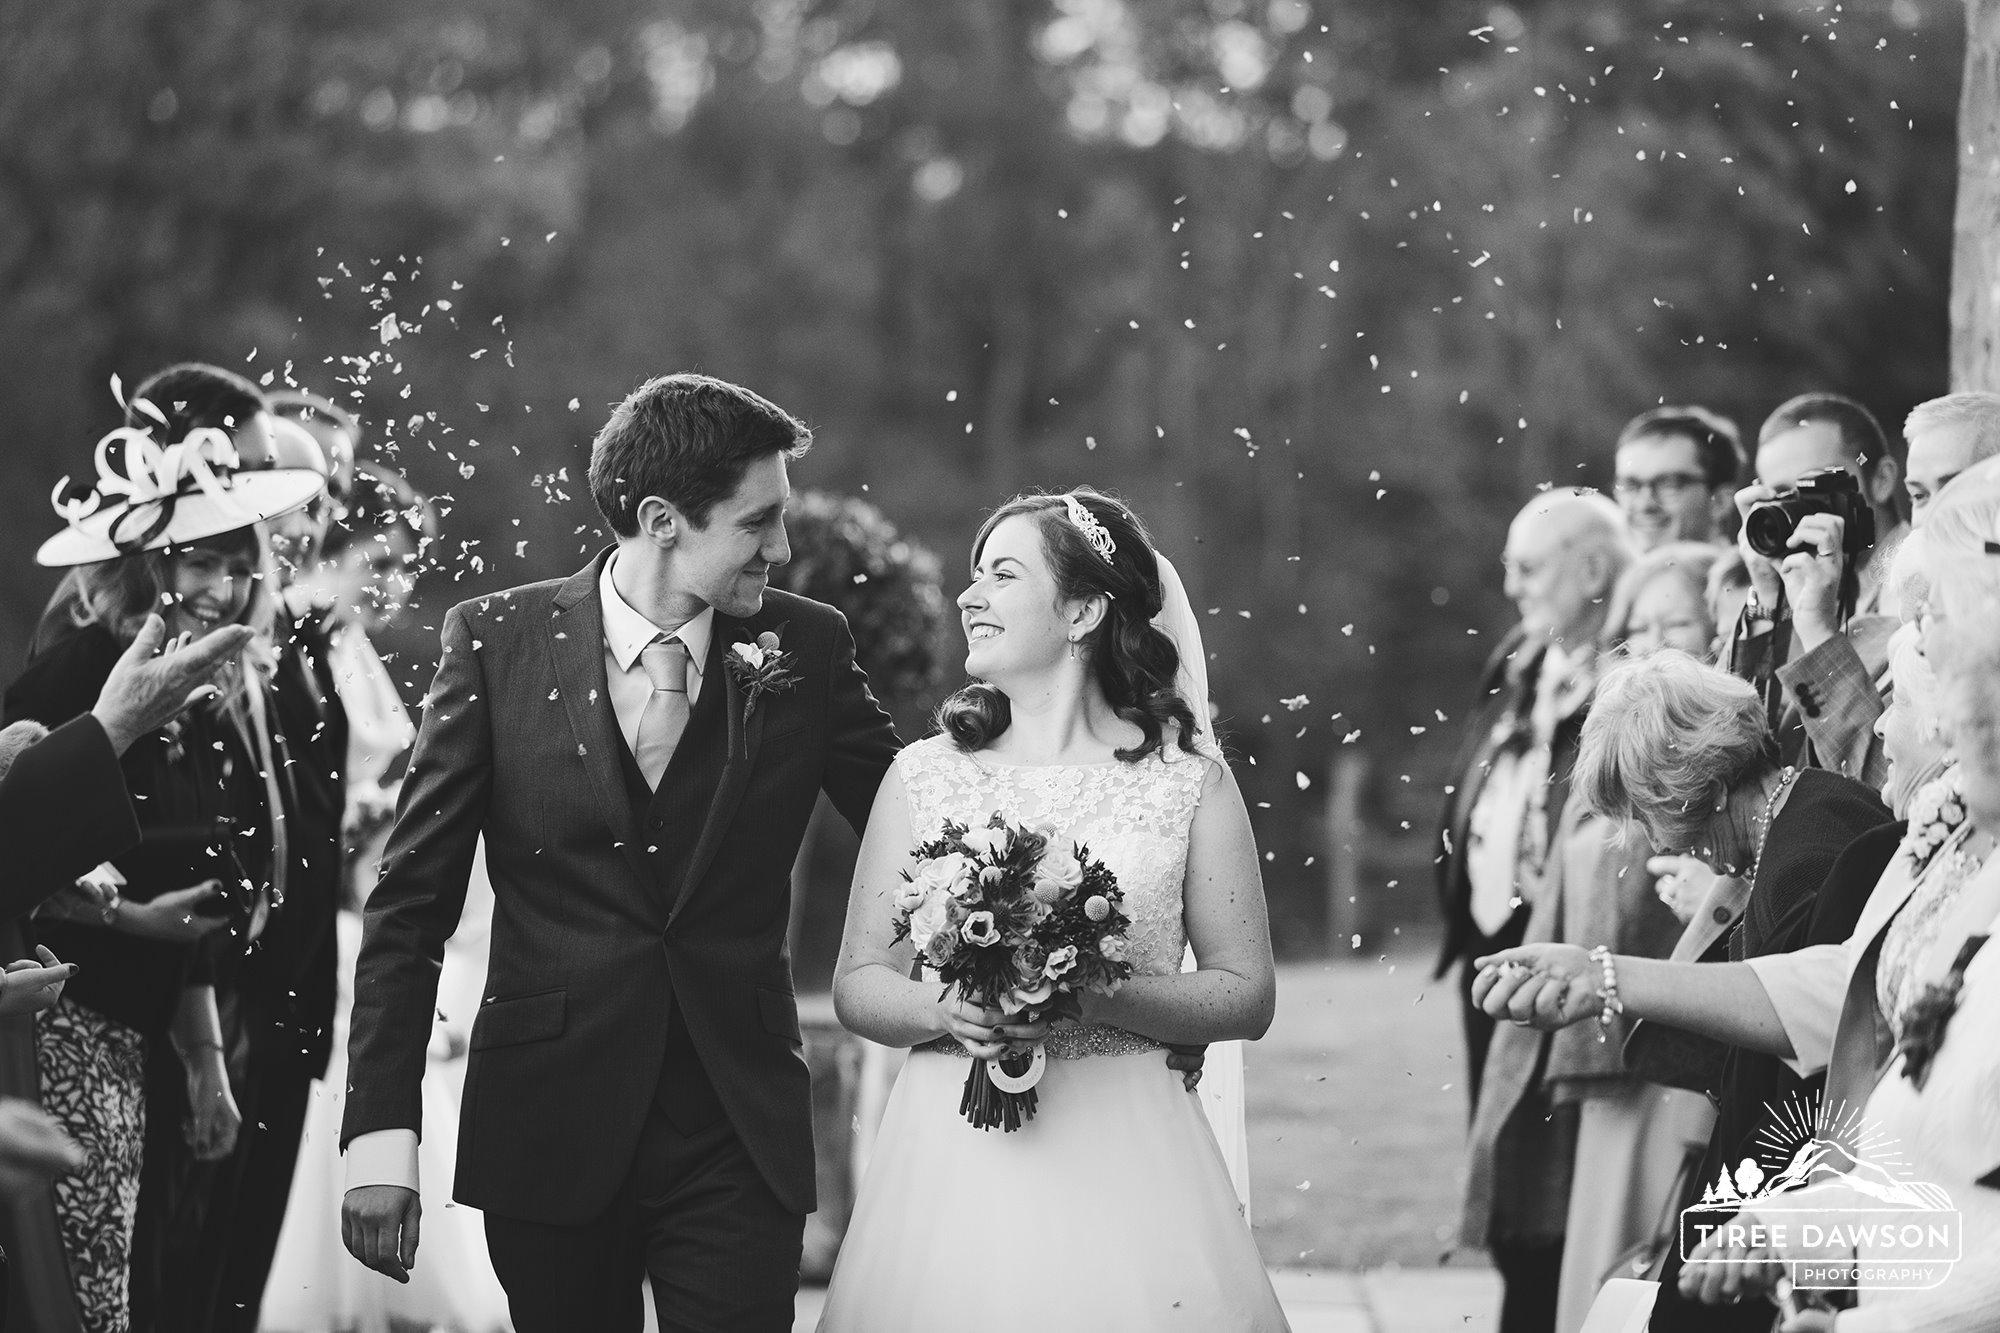 The Happy Bridal Couple.